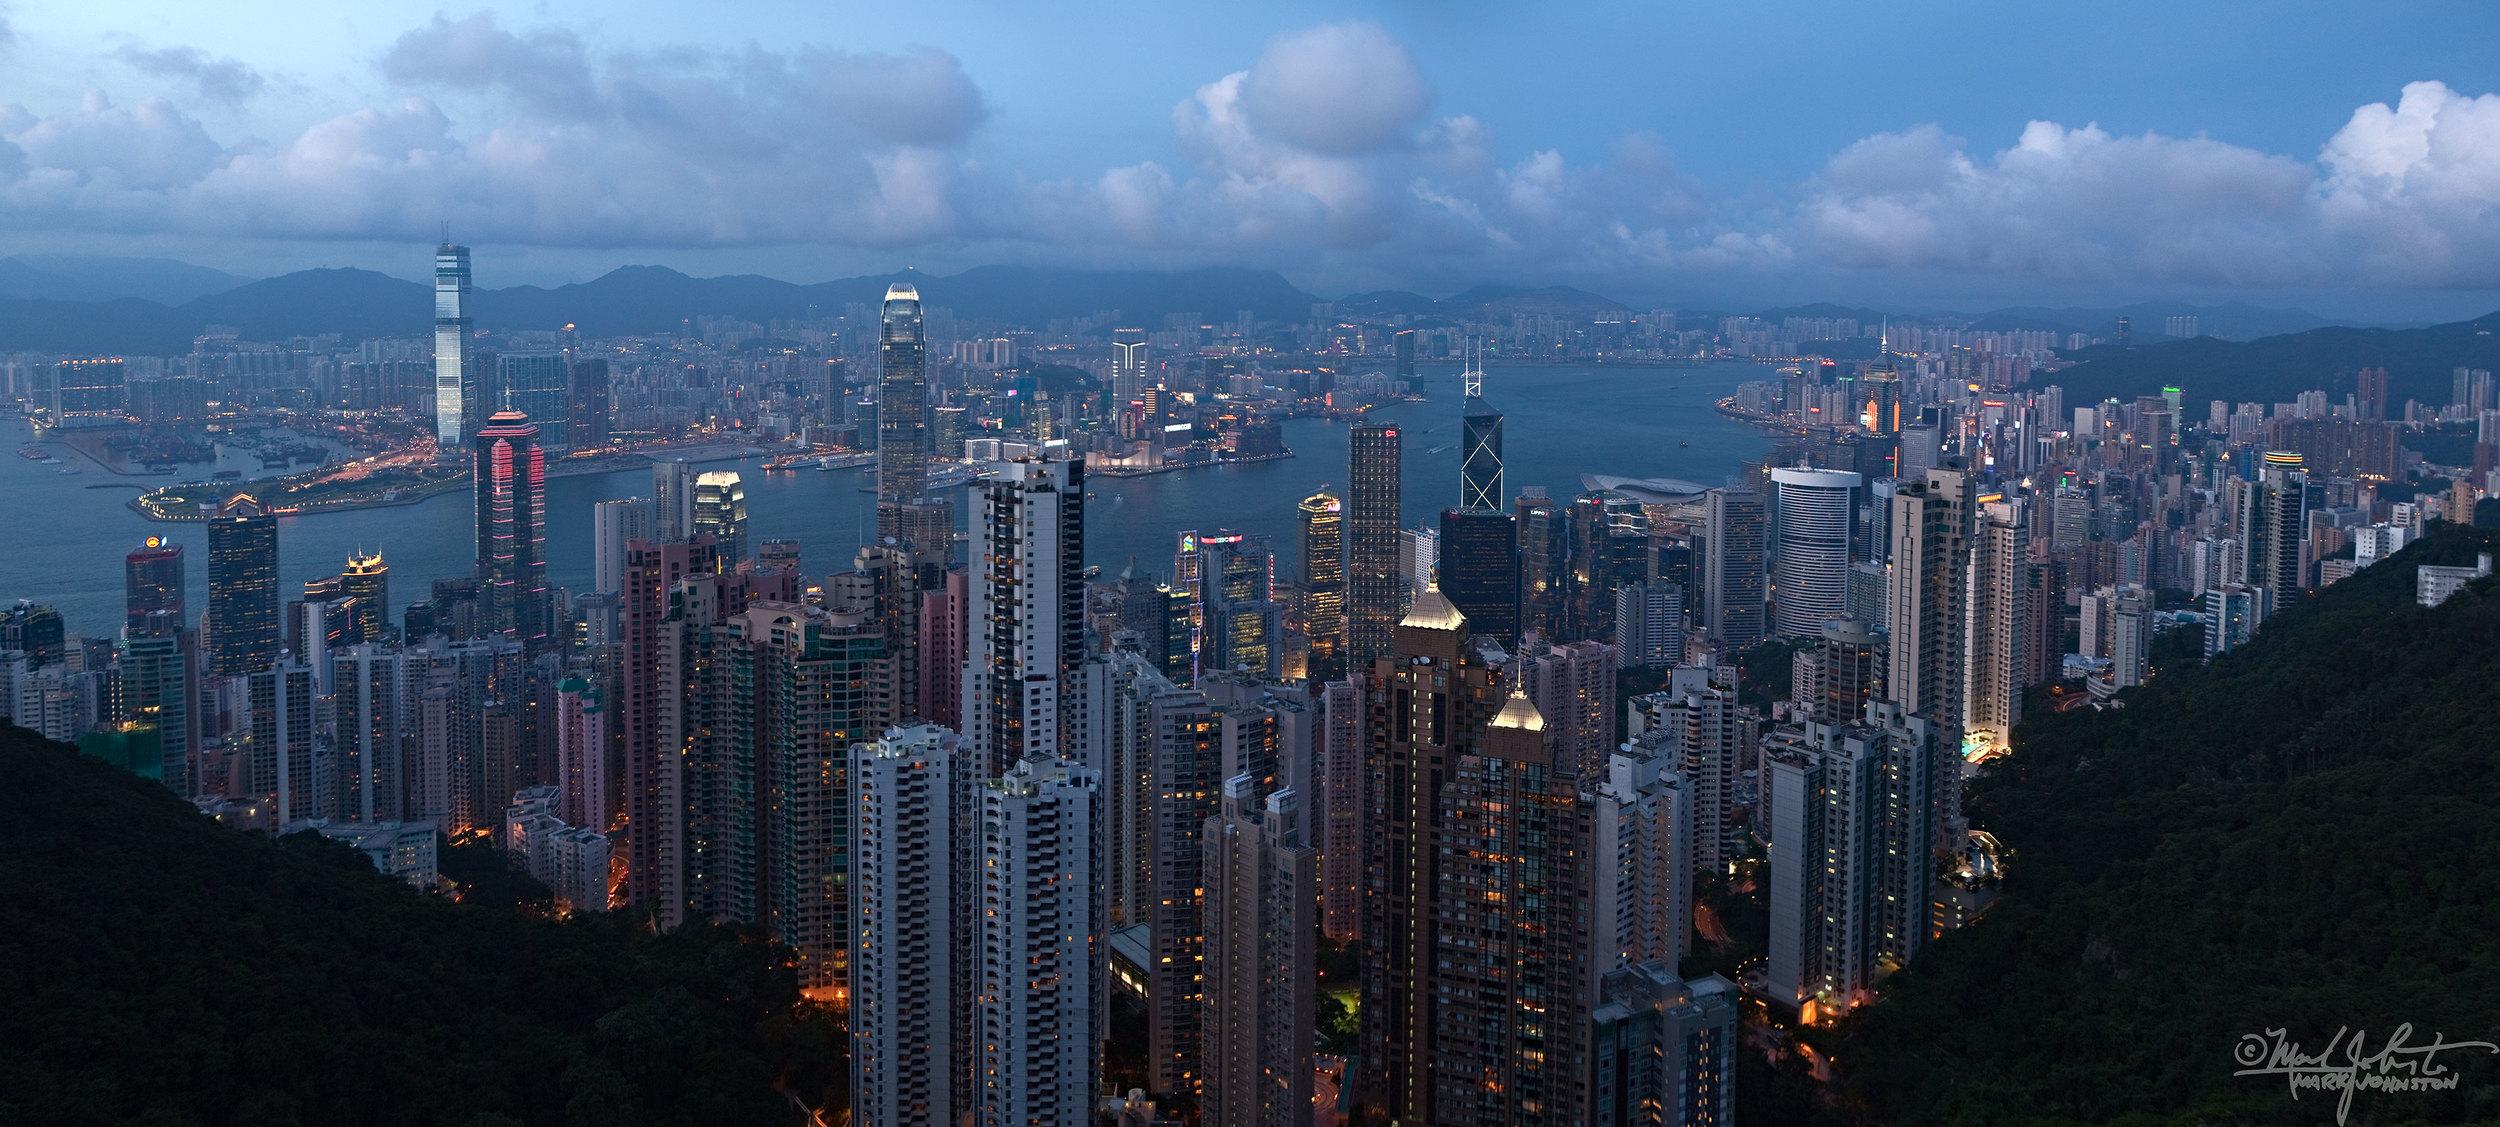 Hong Kong, and across Victoria Harbor, Kowloon.